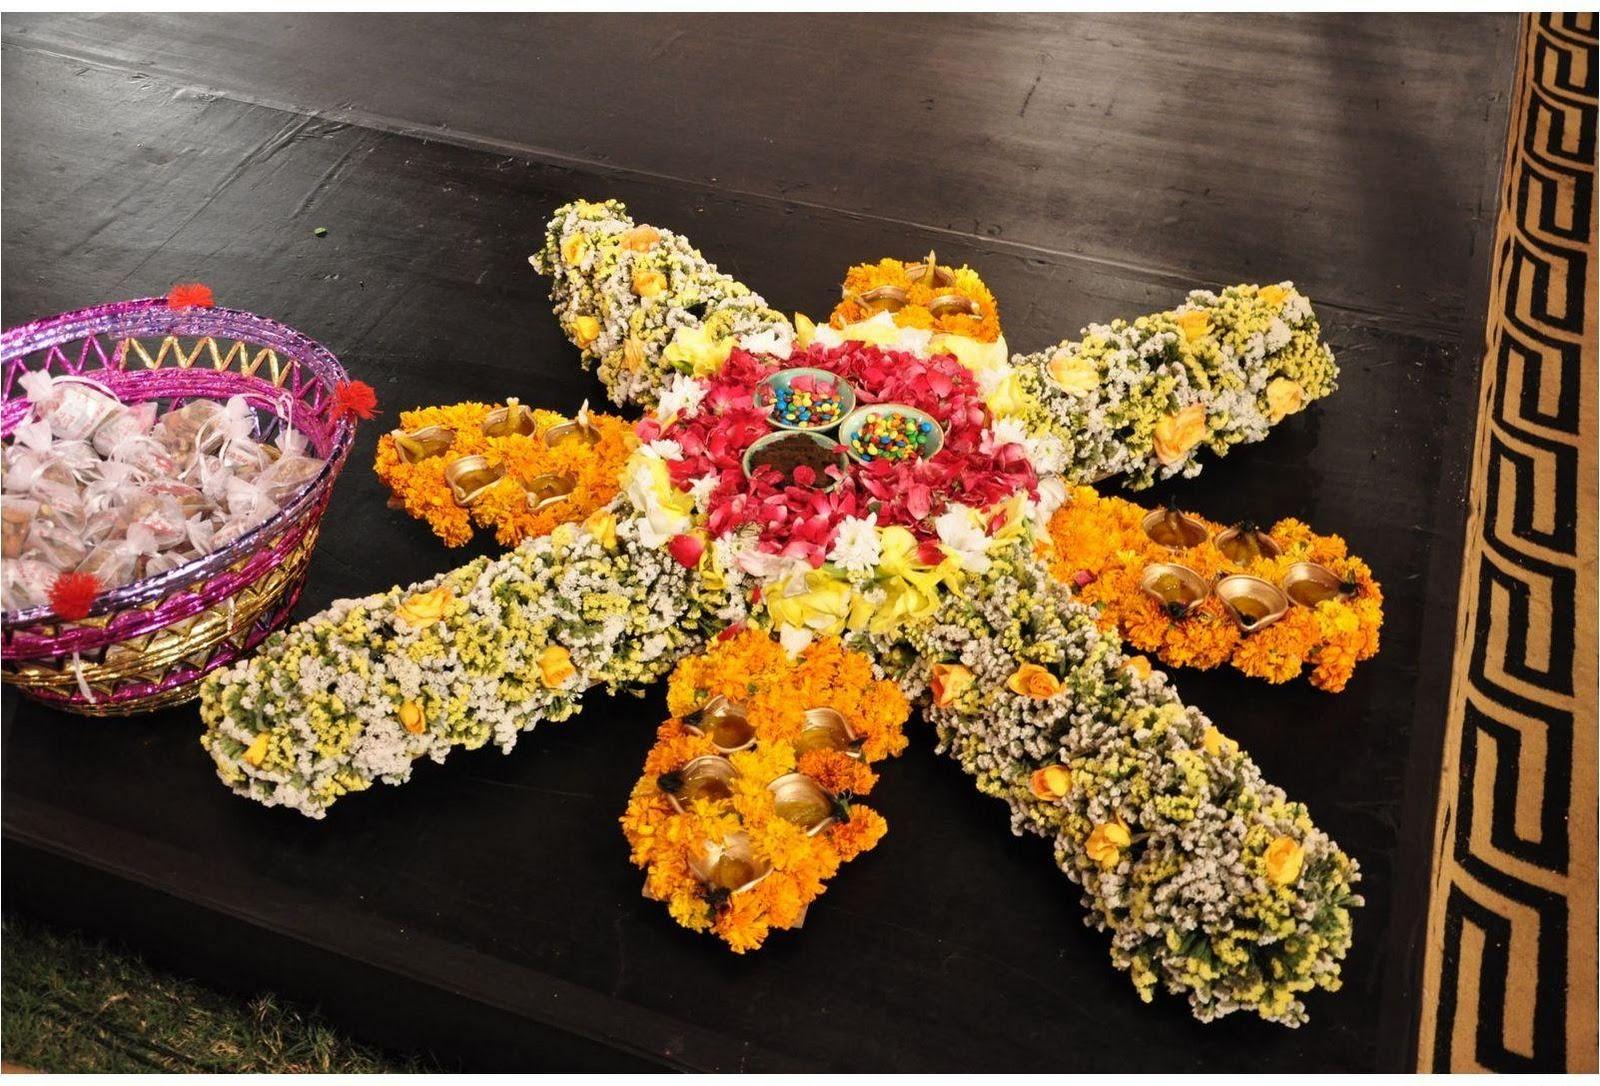 Mehndi Tray Decoration Colours And Joy Mehndi Thaalhenna Tray 35 & Mehndi Tray Decoration 100 Images About Mendi Taal On Pinterest ...